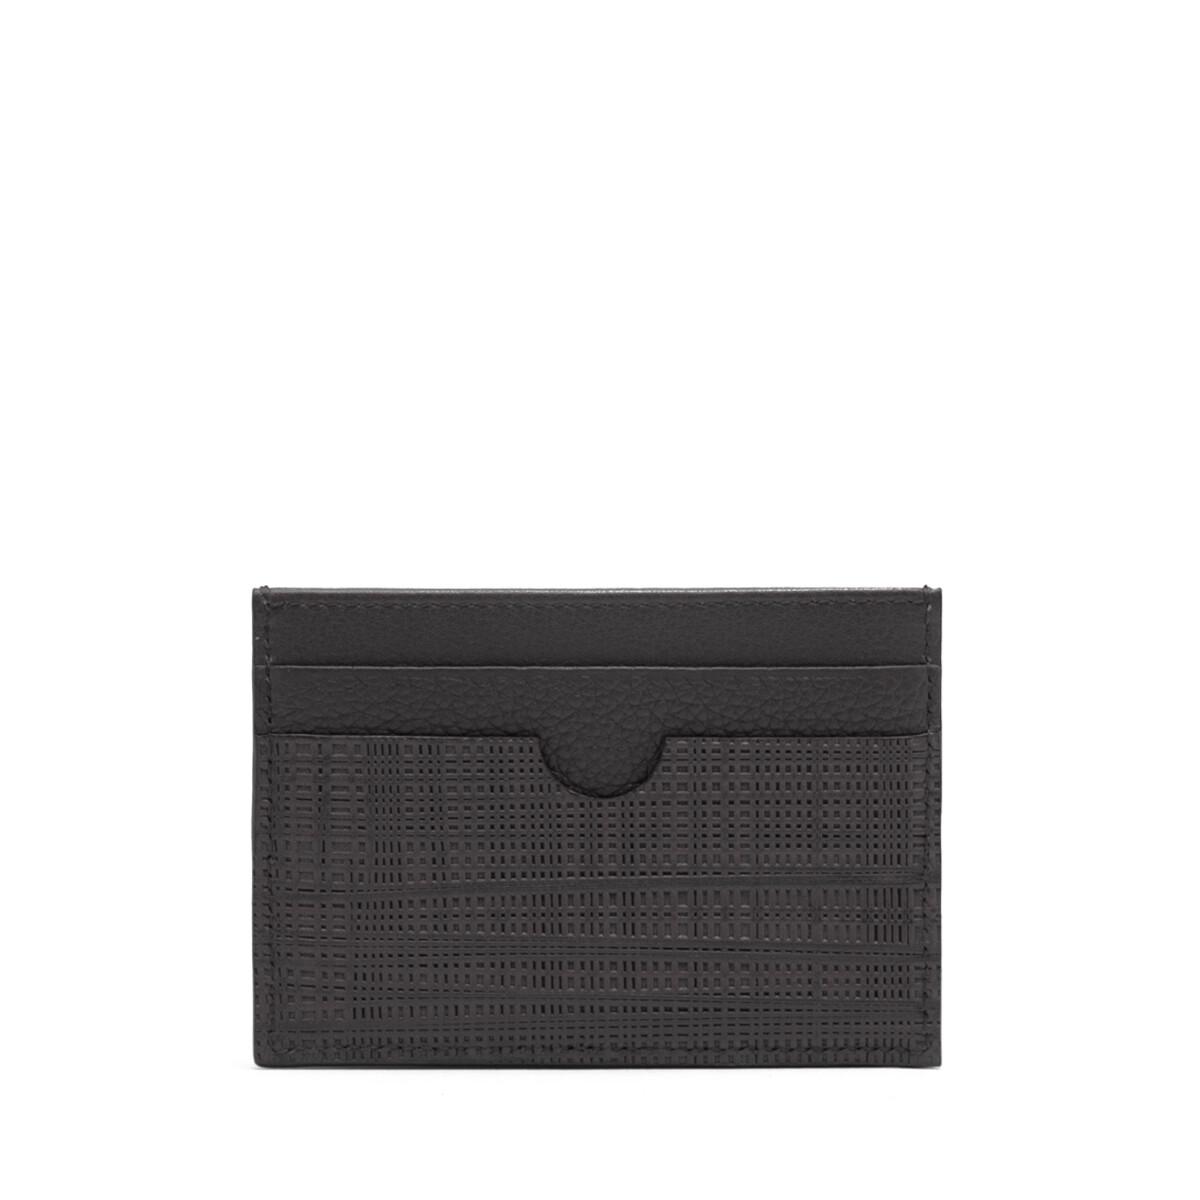 LOEWE Linen Plain Cardholder Black front